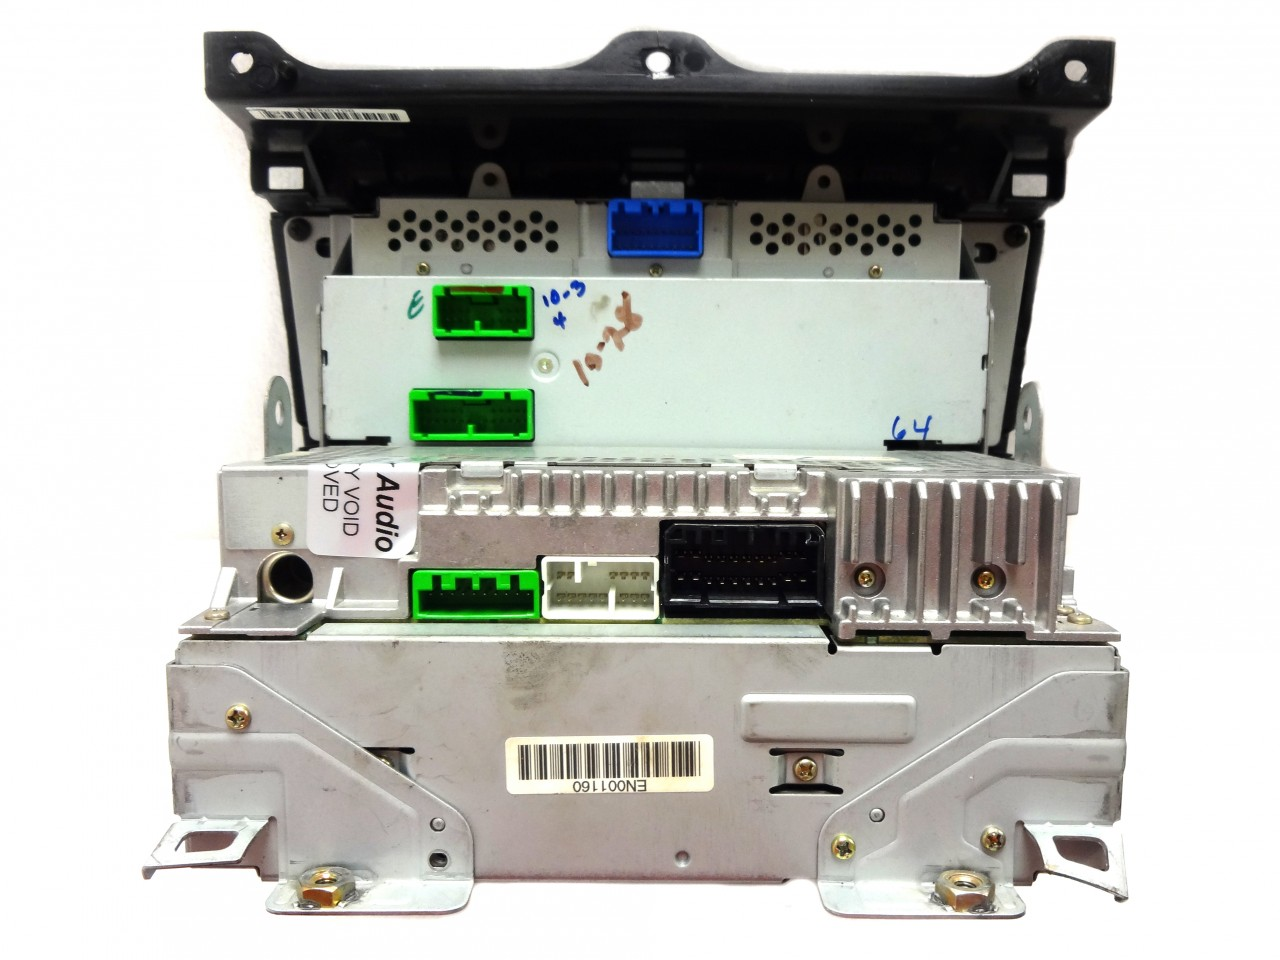 honda civic cd player wiring diagram 2007 ac 04 05 accord navigation gps lcd screen radio 6 disc